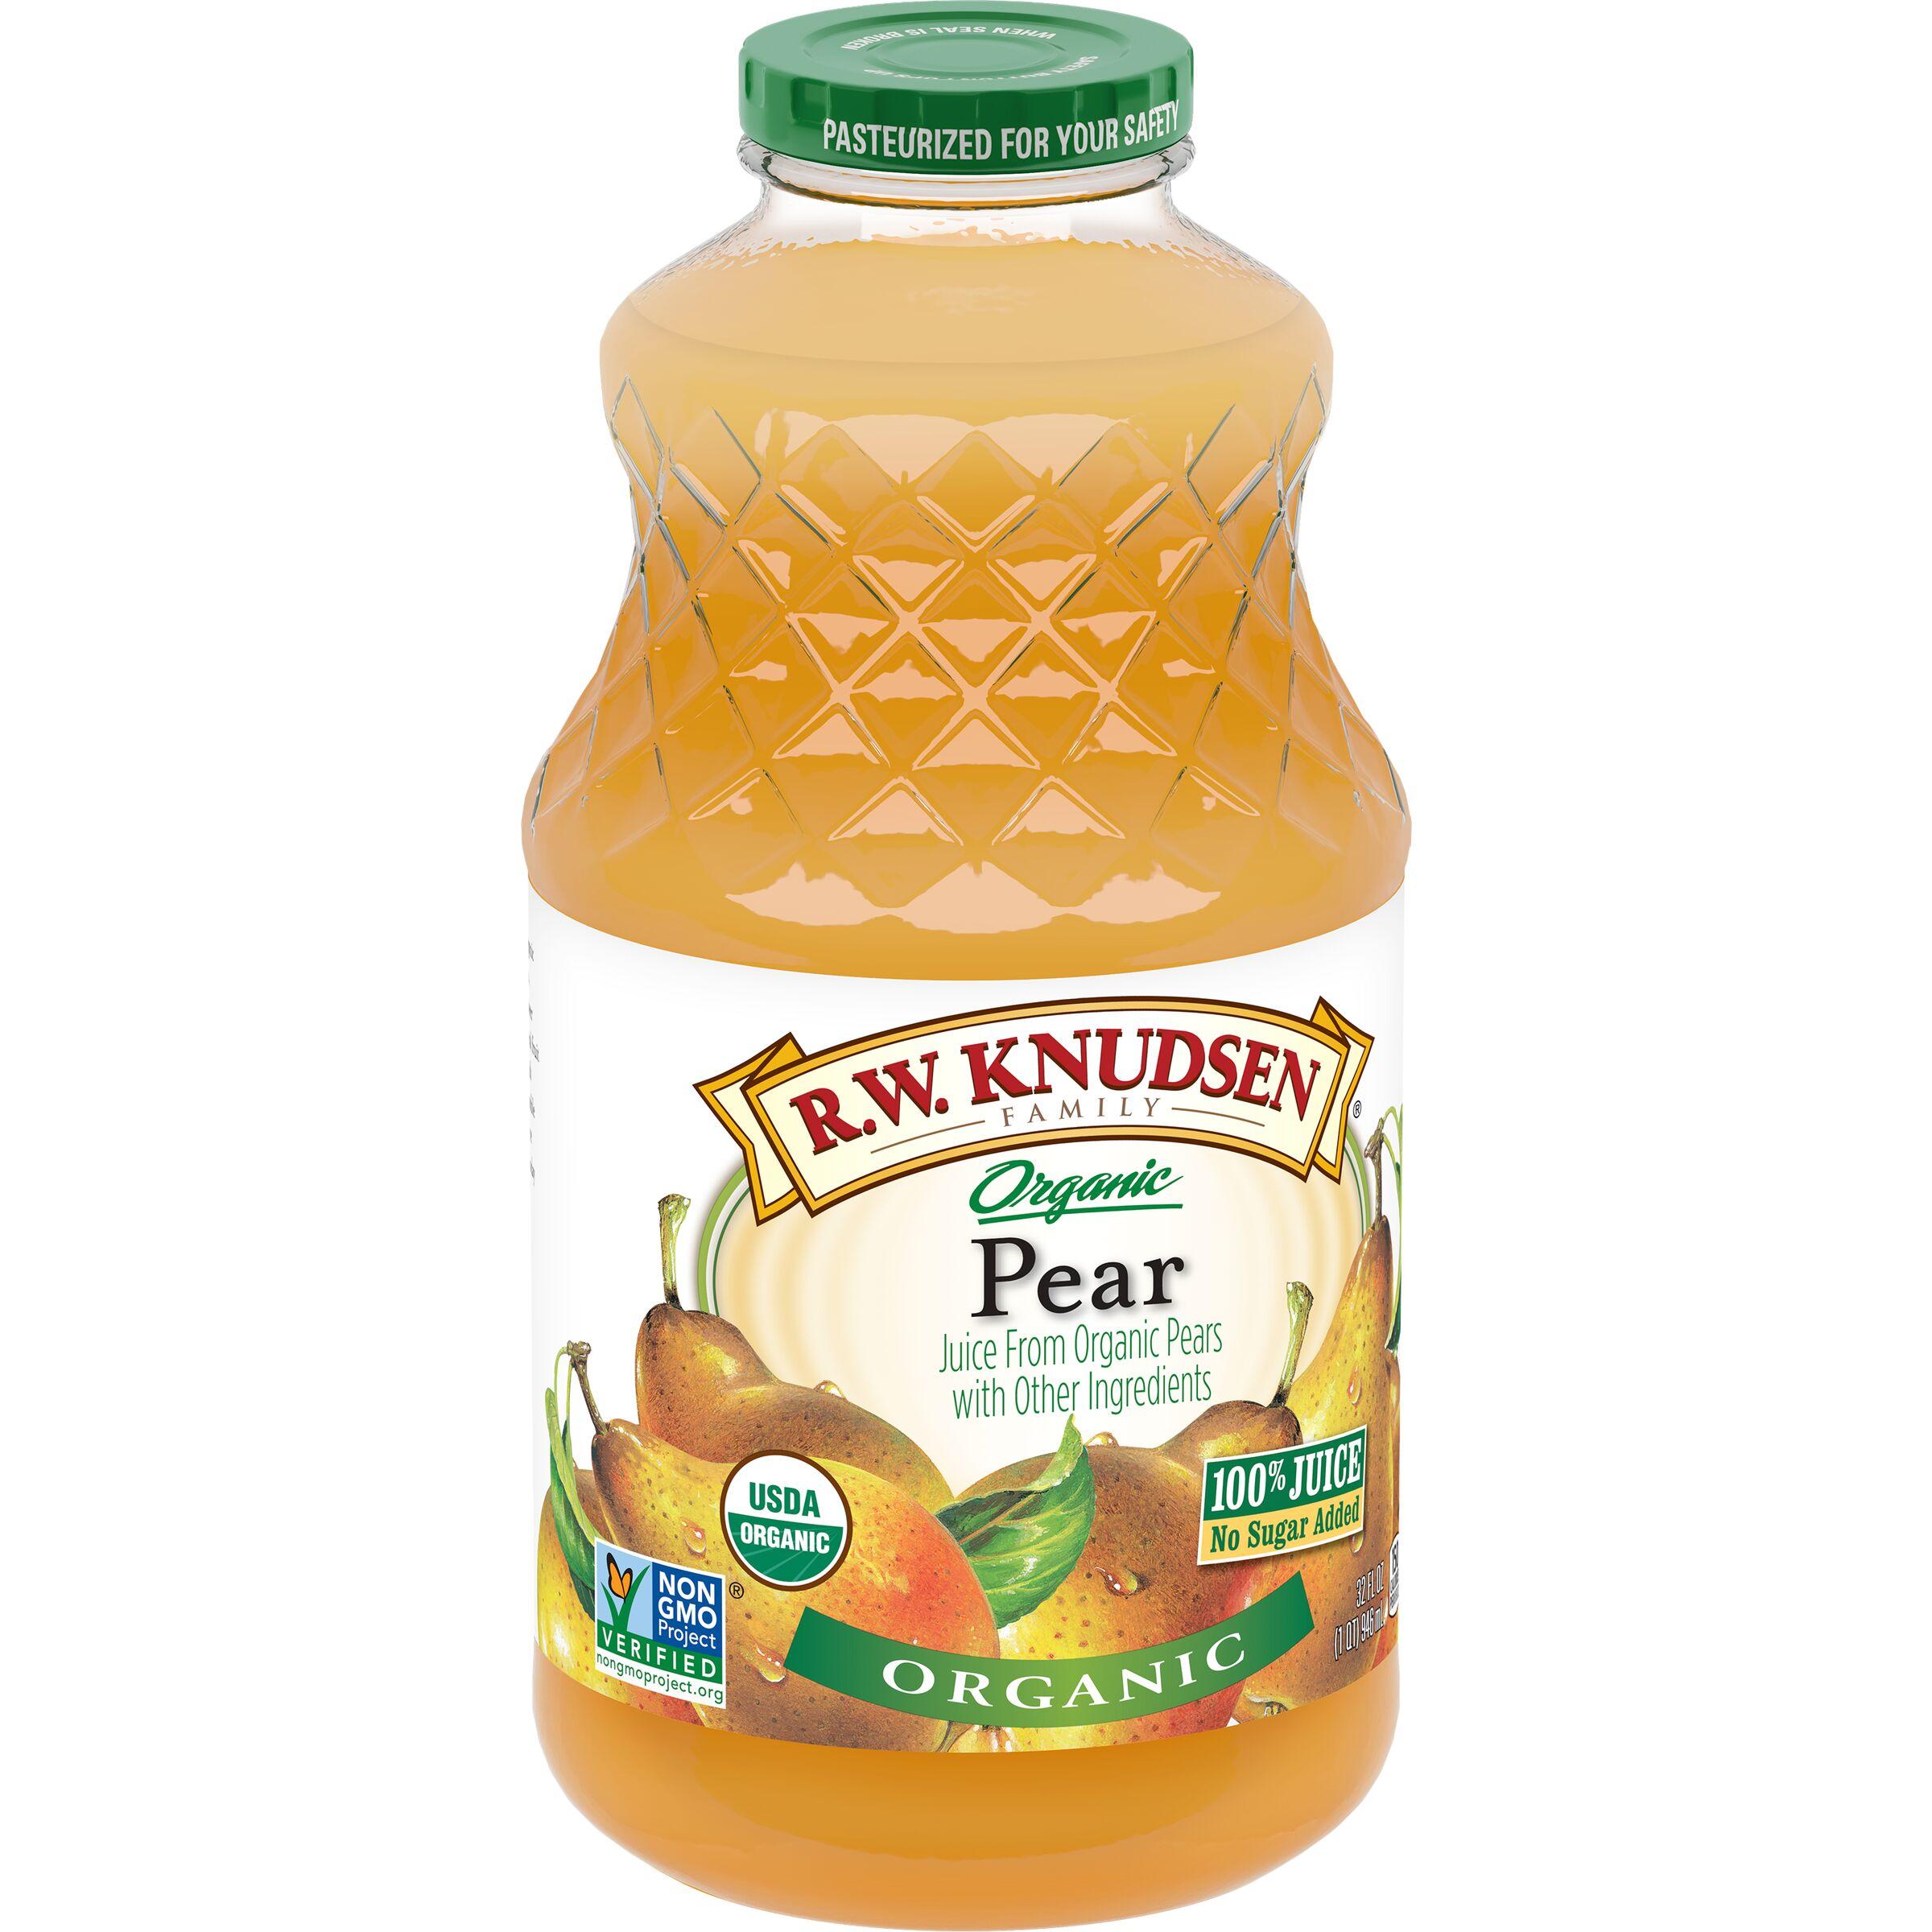 R.W. Knudsen Family  Organic Pear Juice